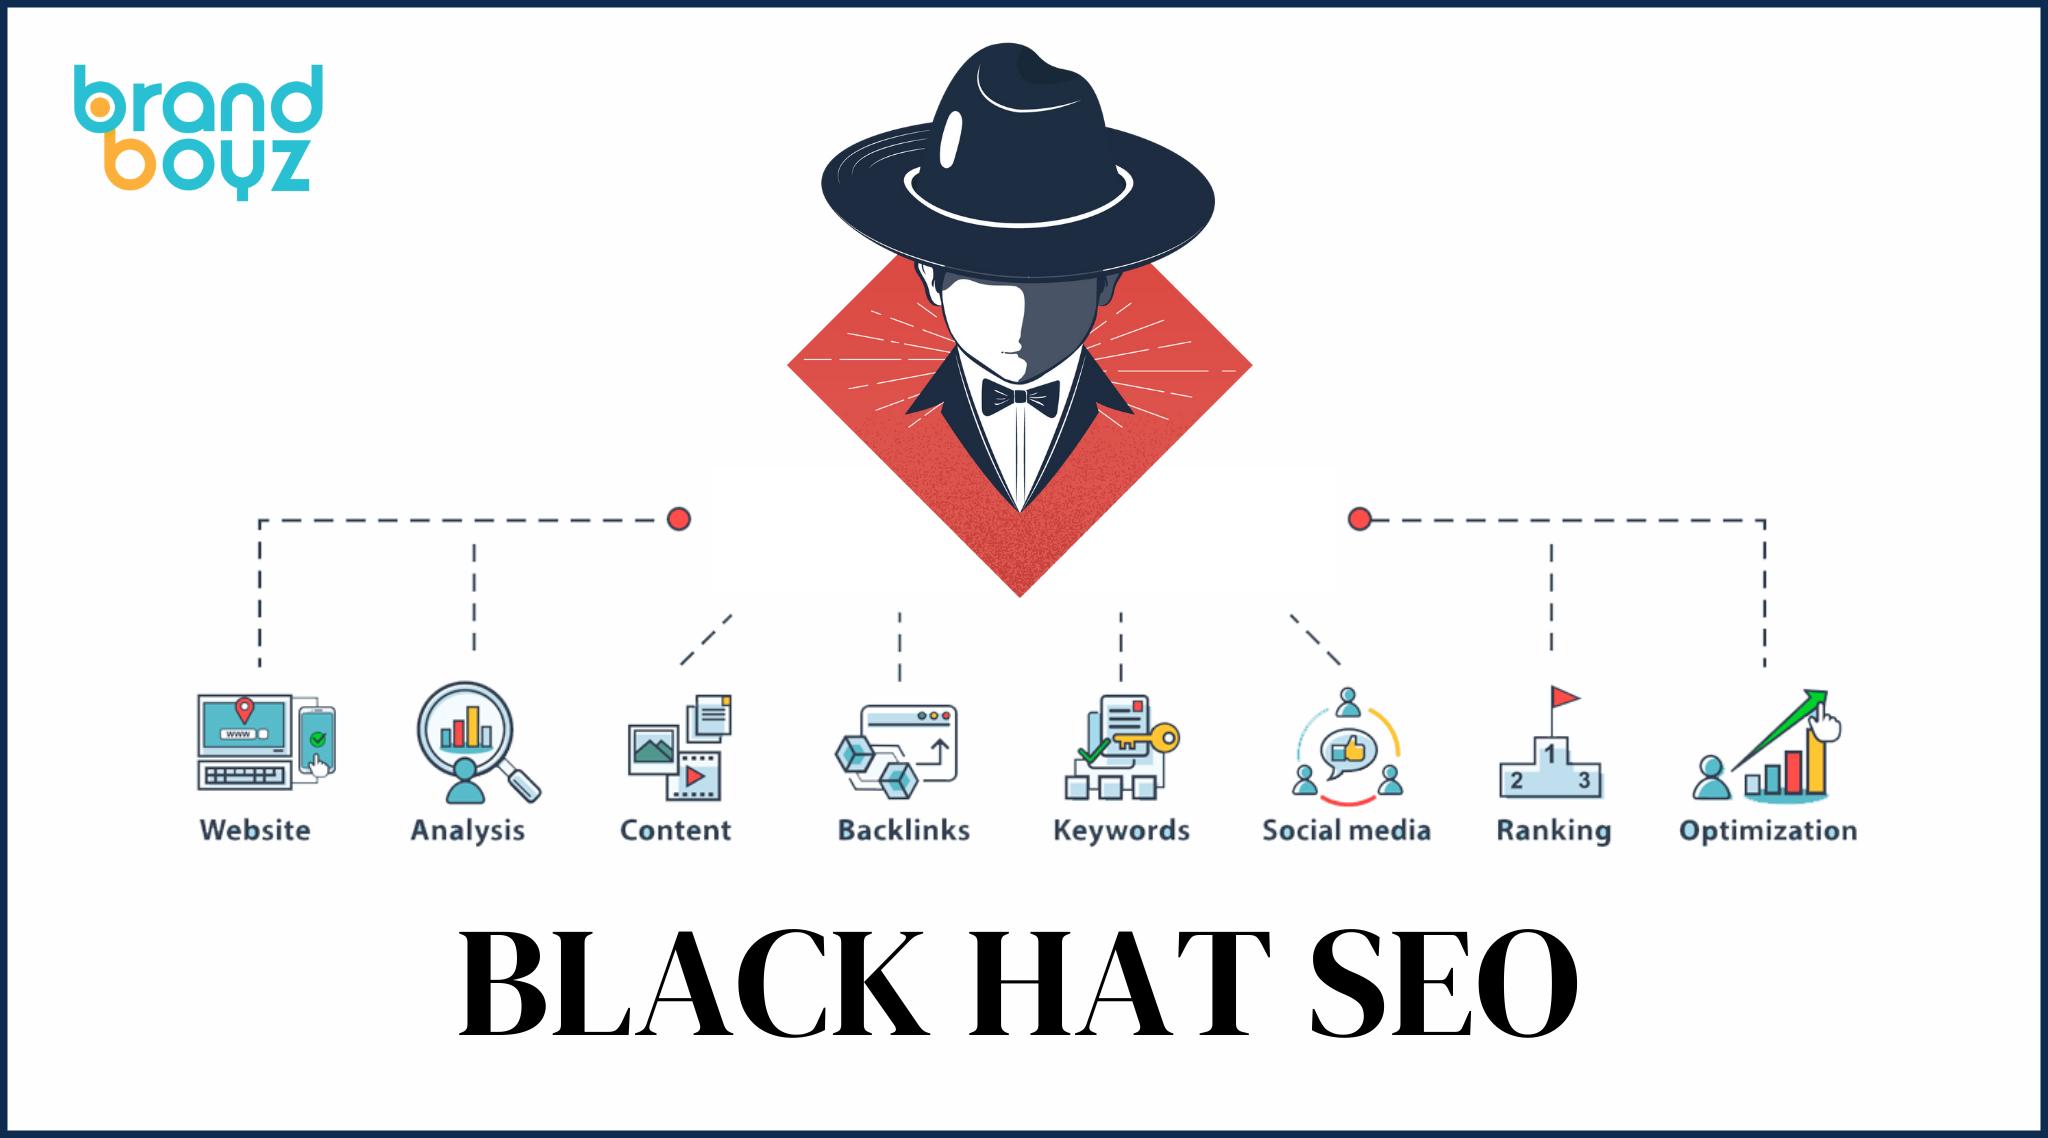 black hat seo - Brandboyz